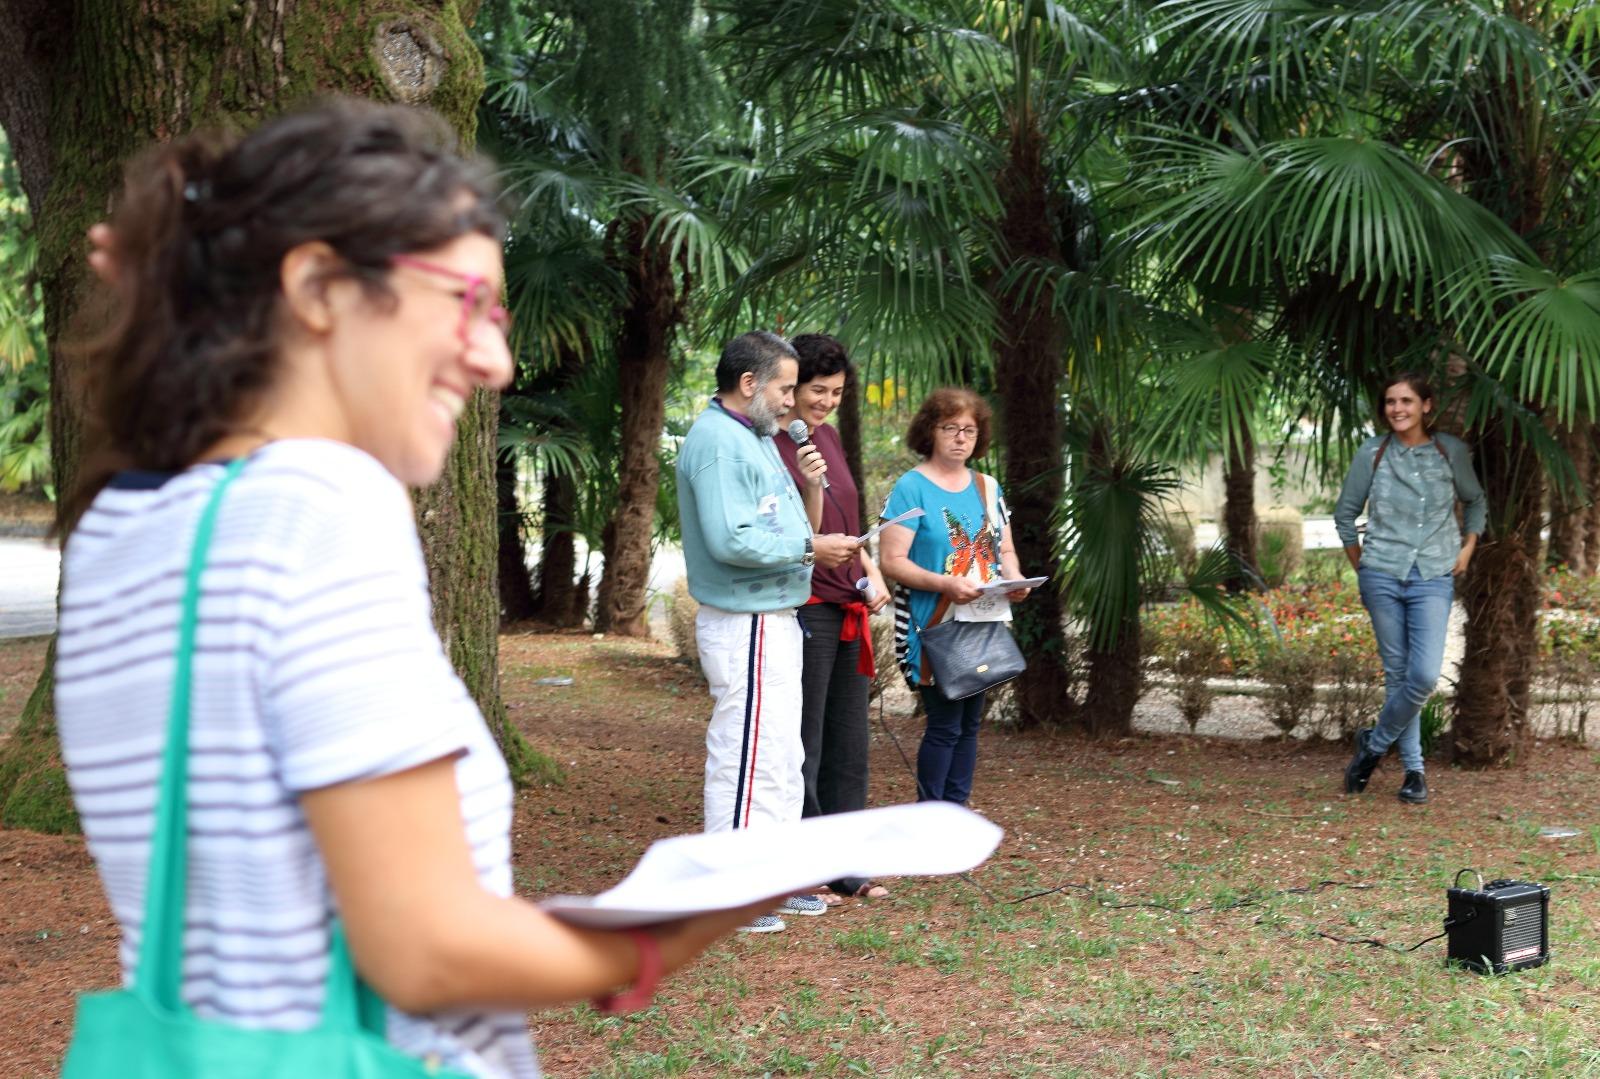 Laboratorio di scrittura Passeggiata Storico Botanica Parco Sant'Osvaldo Udine